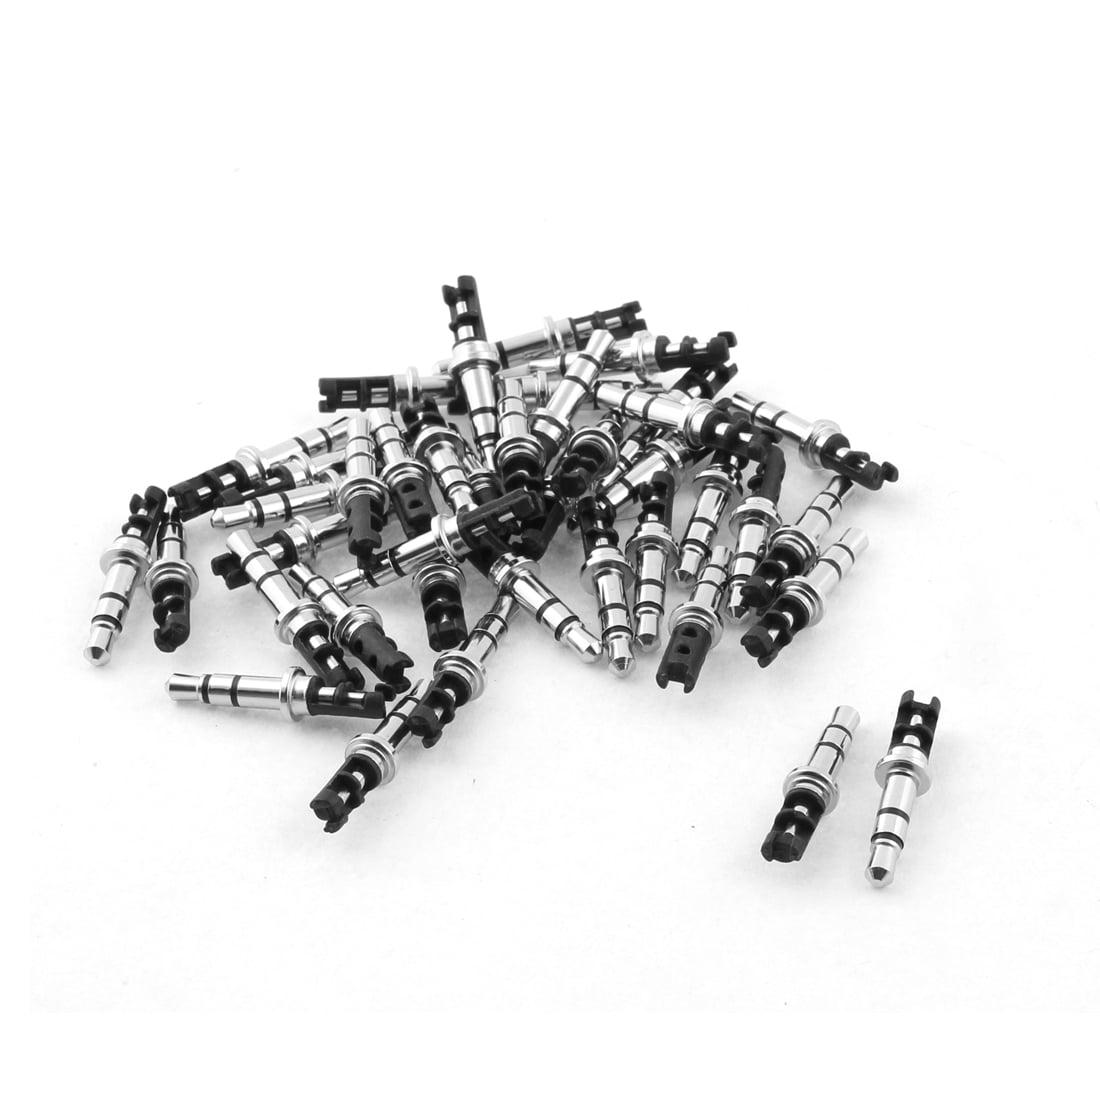 35mm Stereo Male Plug Repair Audio Headphone Jack Solder Connector Wiring Black 40pcs